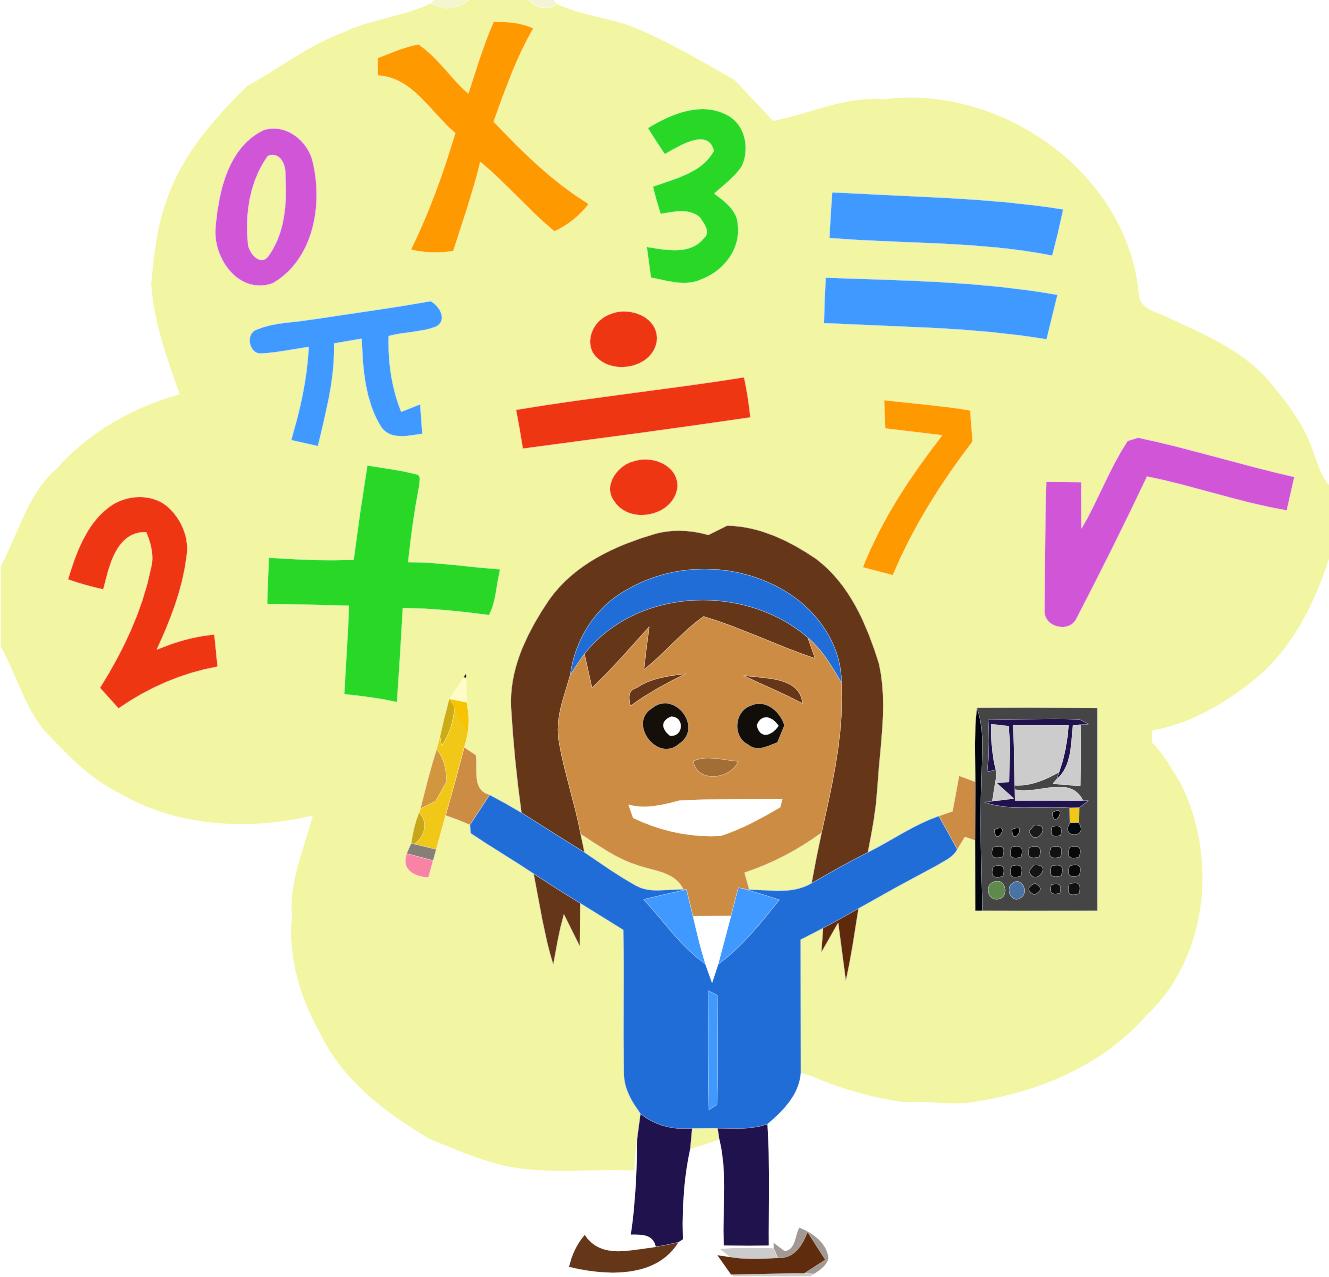 Math clipart mental math, Math mental math Transparent FREE.